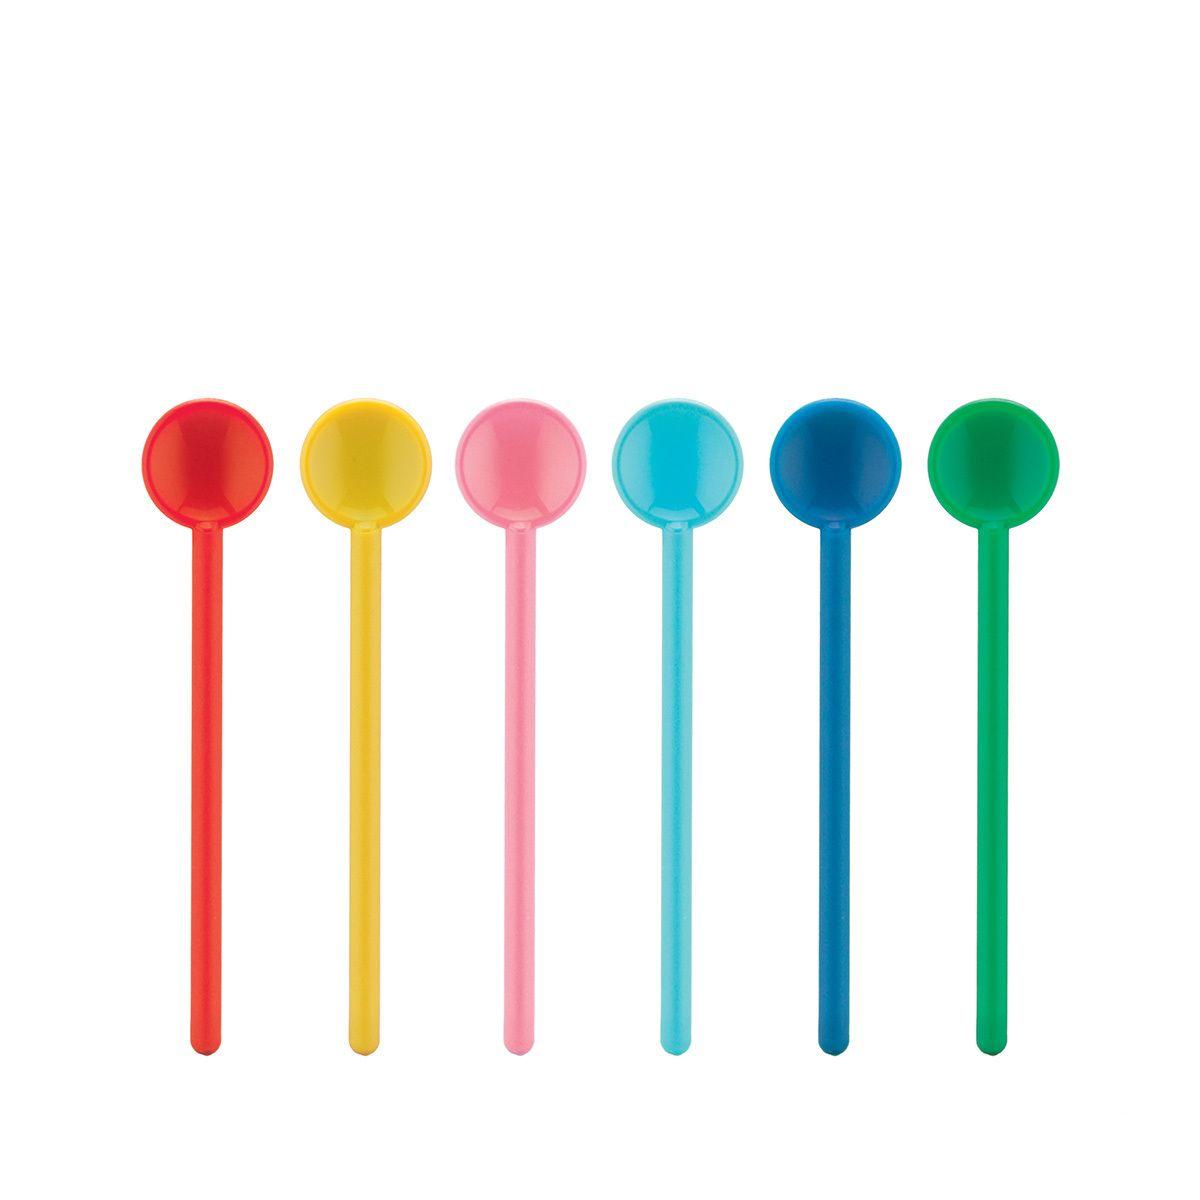 Spoon BISTRO Bodum